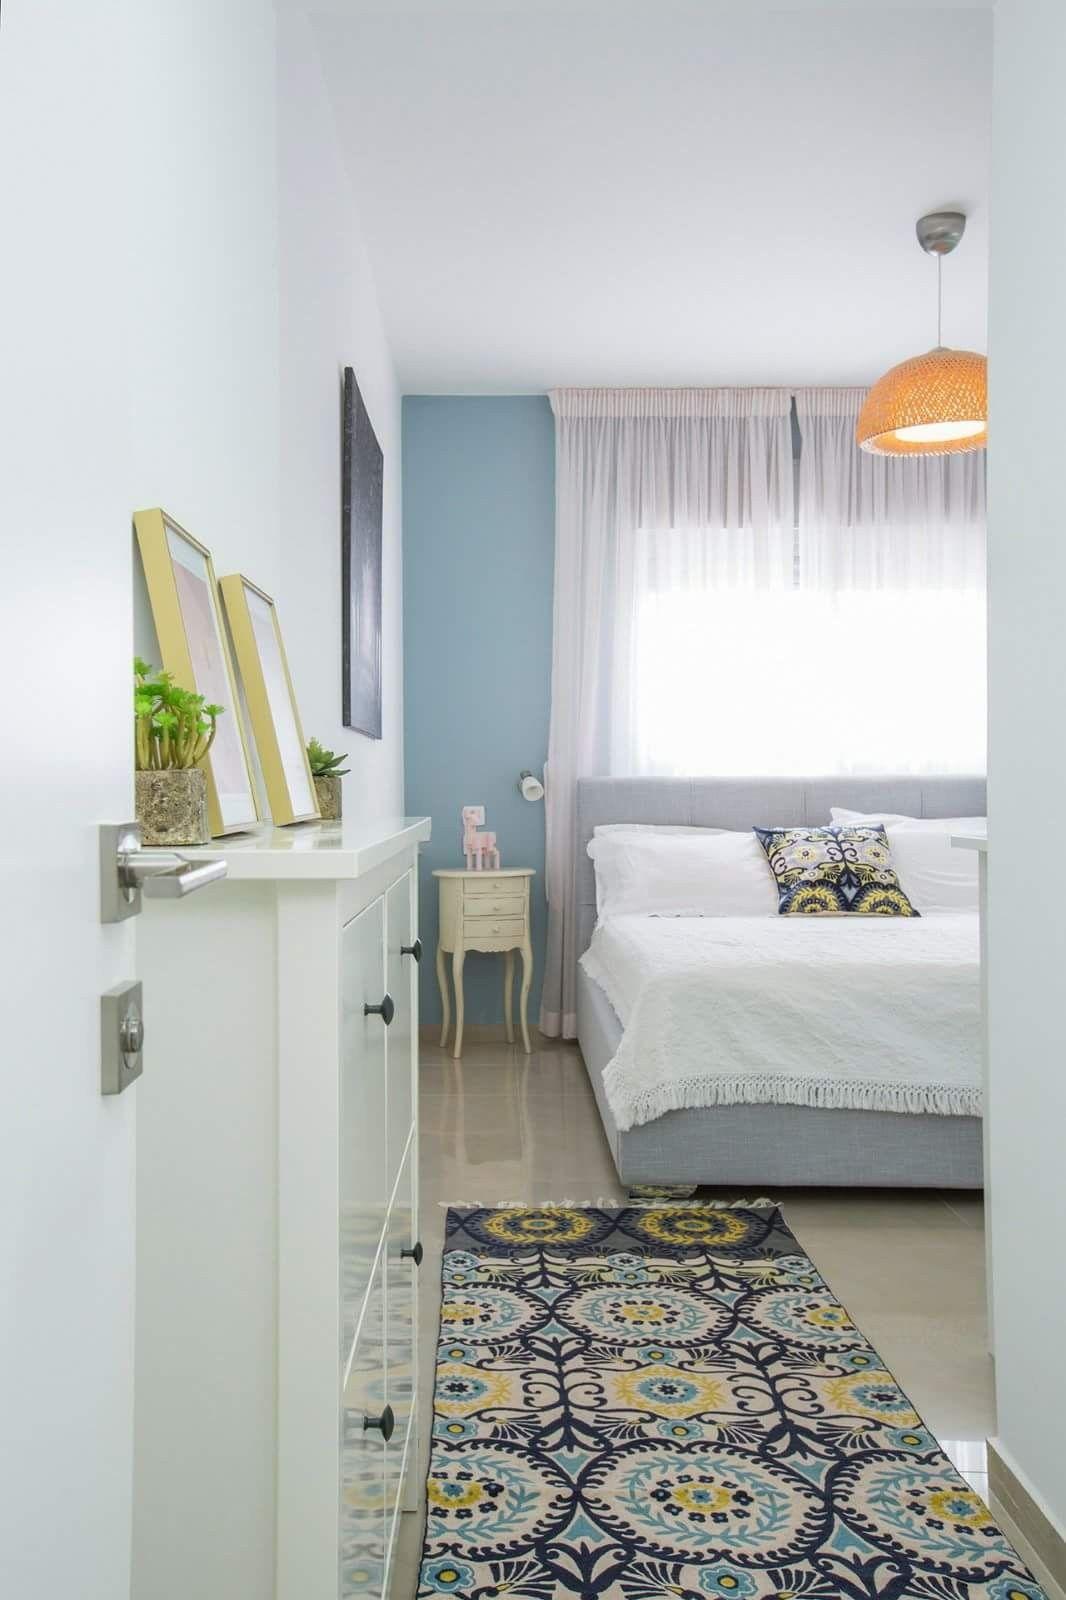 Pin by Sharon Cohanim on חדר שינה הורים Minimalist